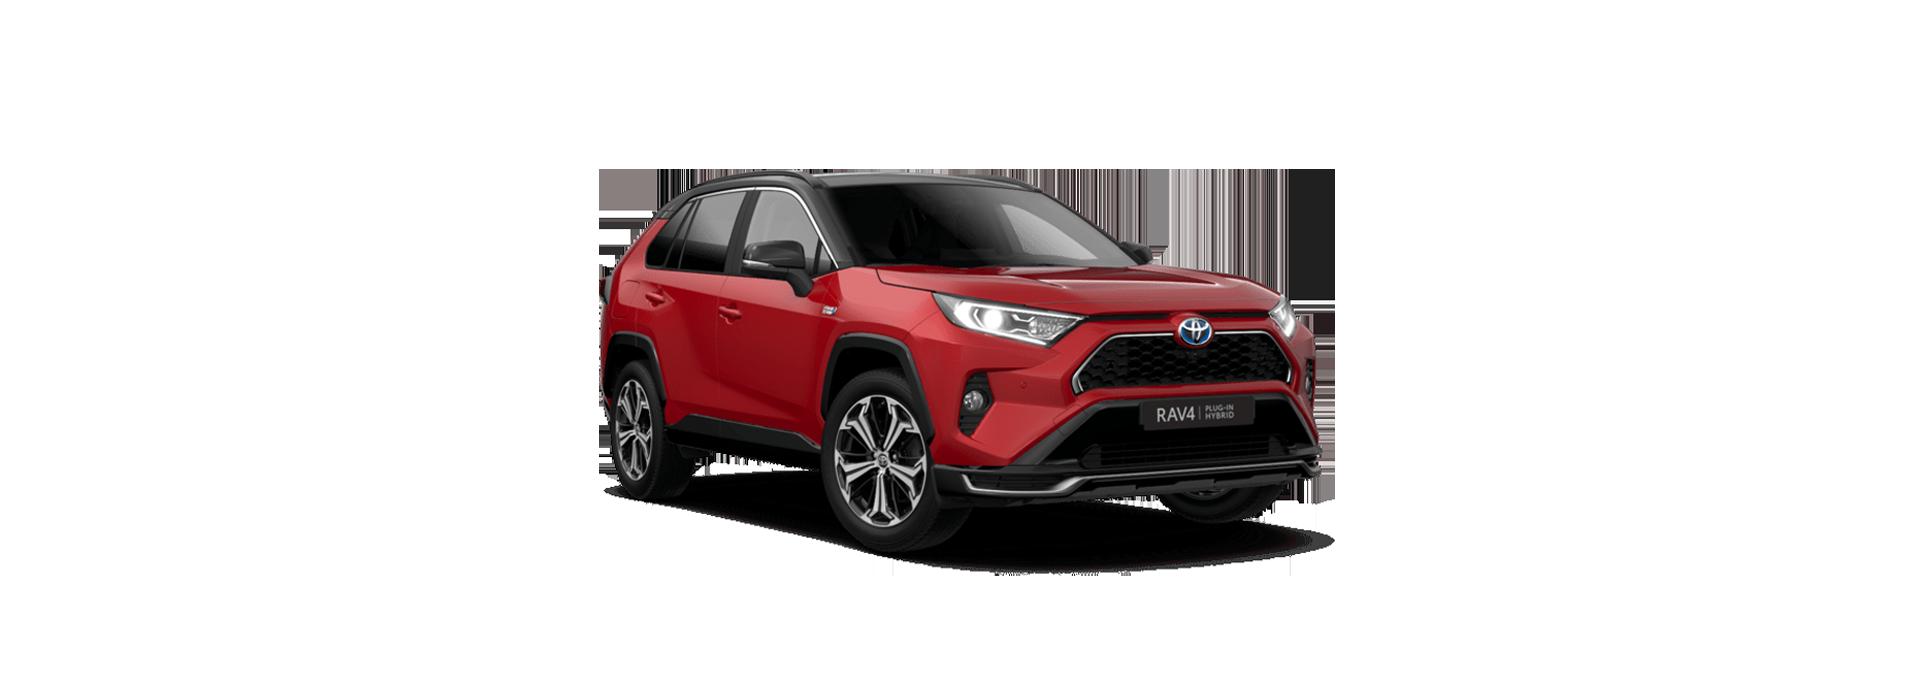 Toyota Nuevo Rav4 Plug-in